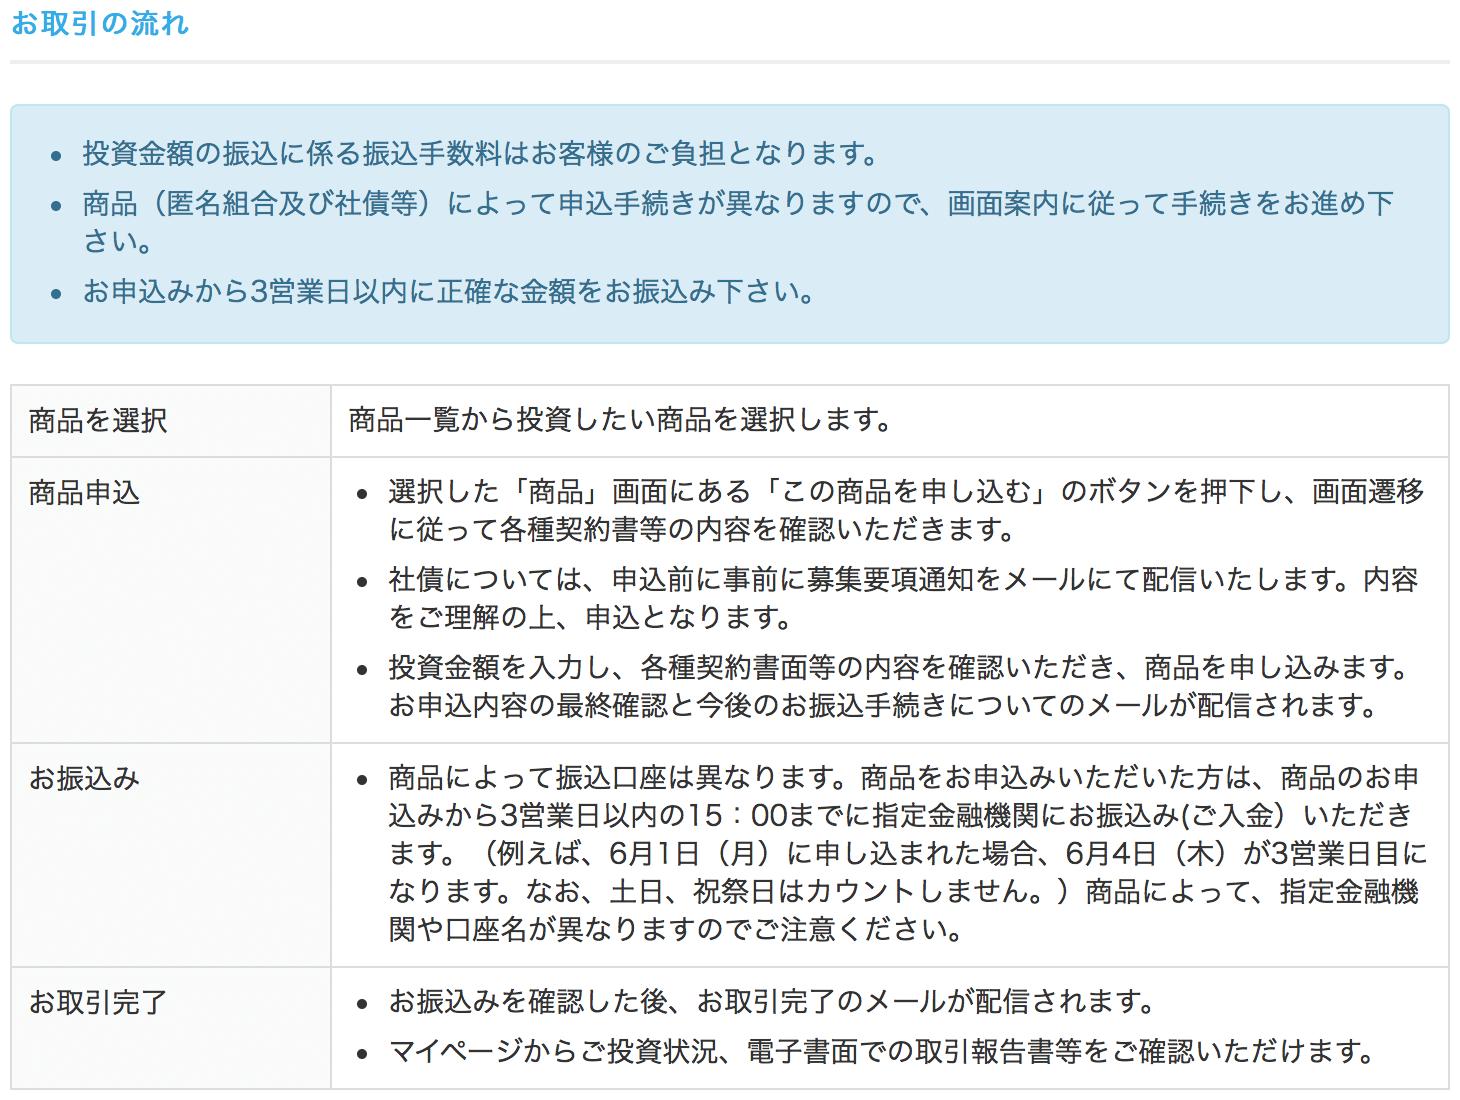 SAMURAIに於ける「口座開設〜投資〜解約」までの流れ